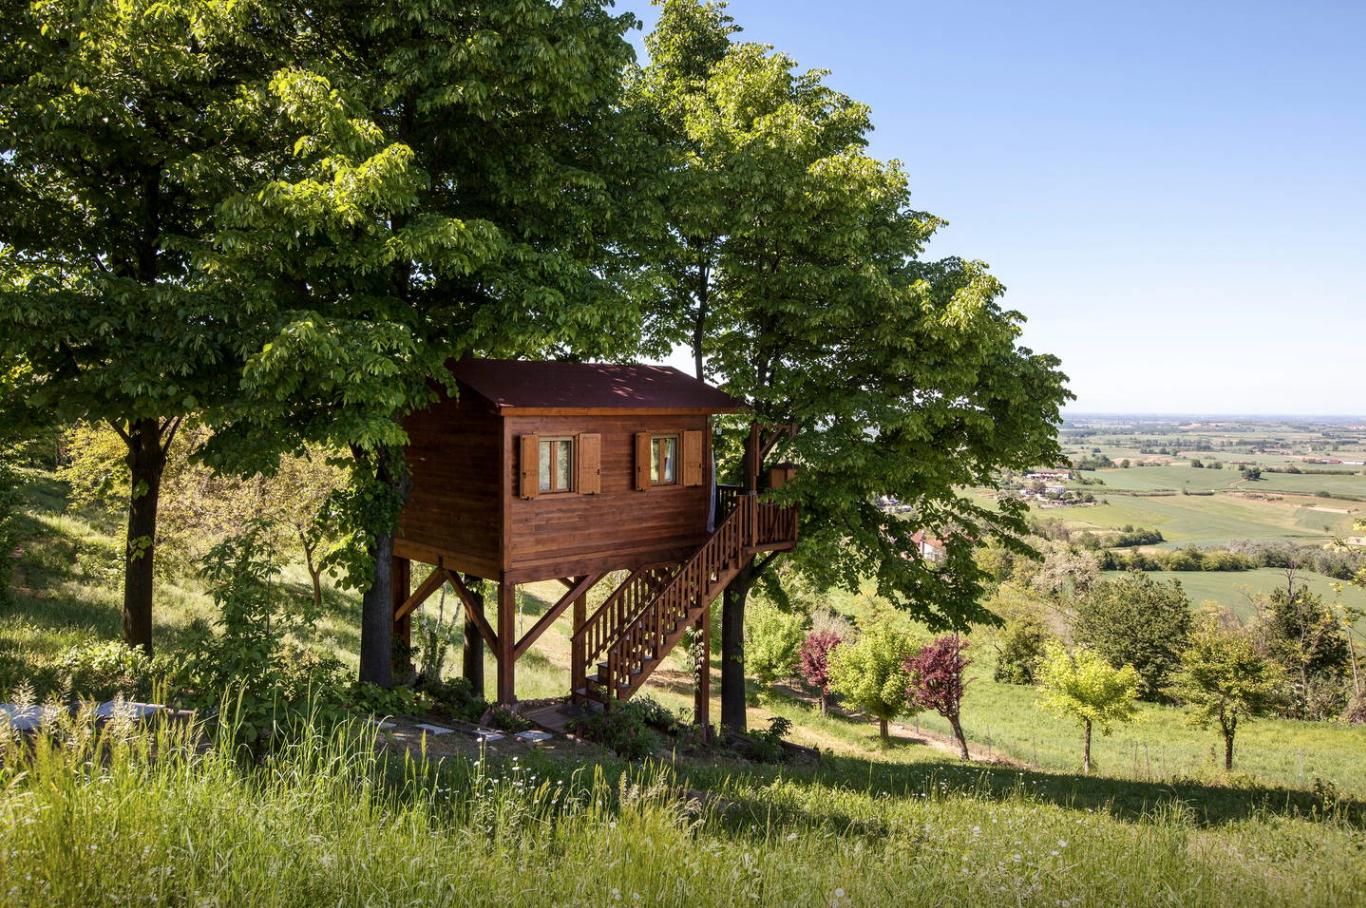 Treehouse Retreats - Aroma(n)tica, Italy Airbnb